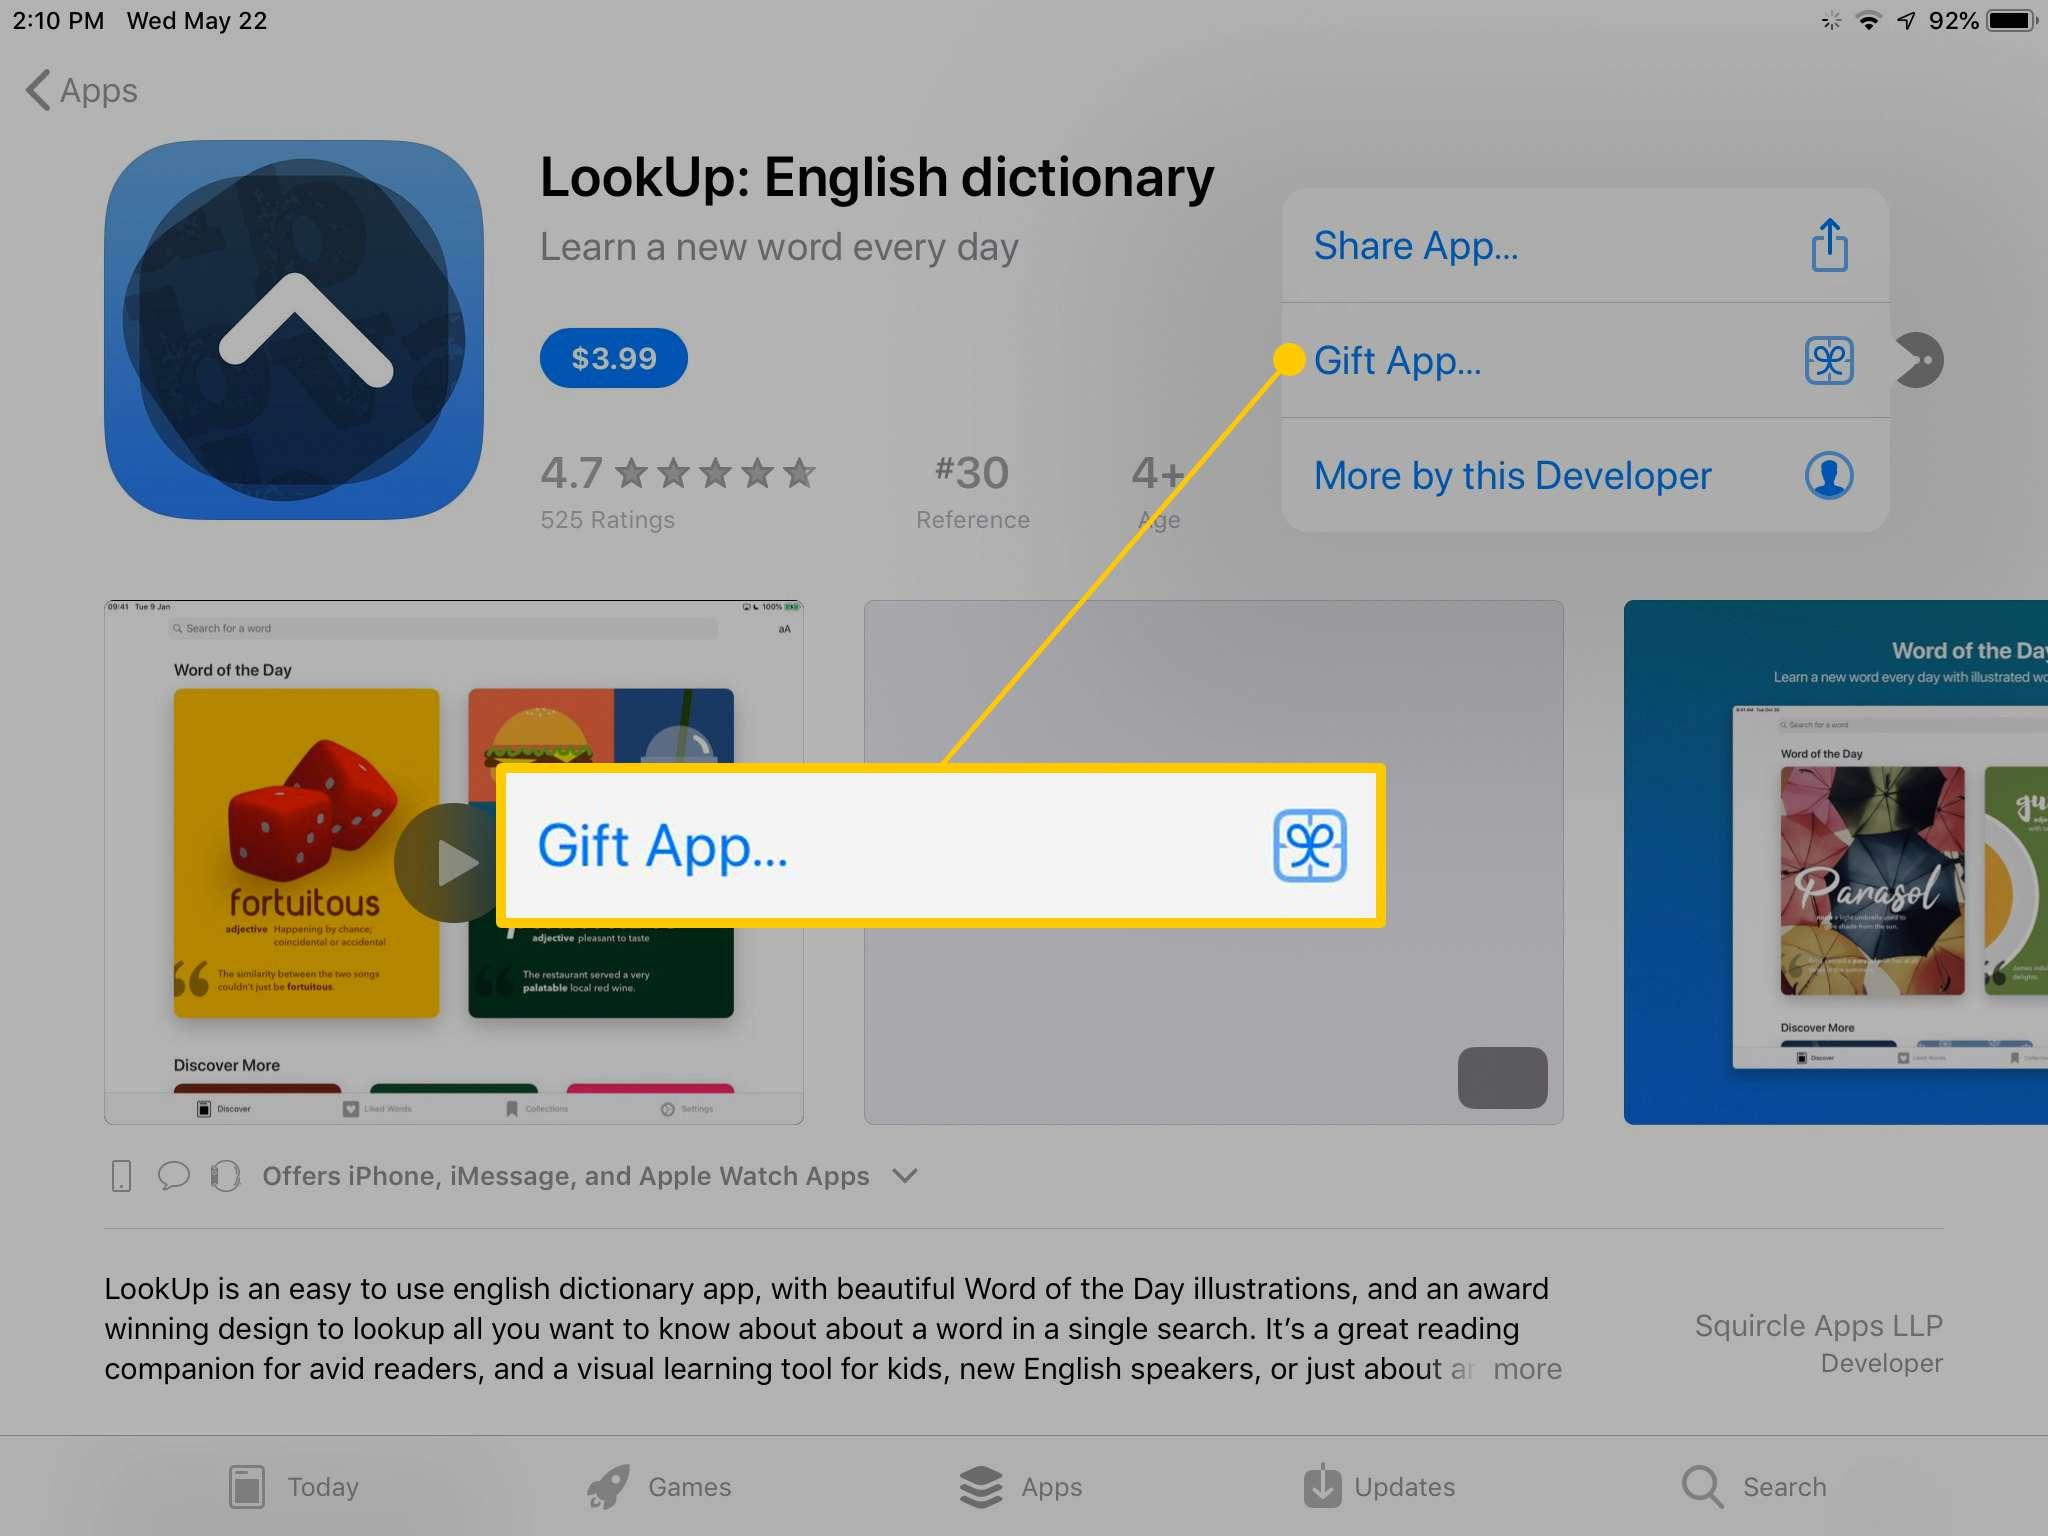 Gift app option in App Store